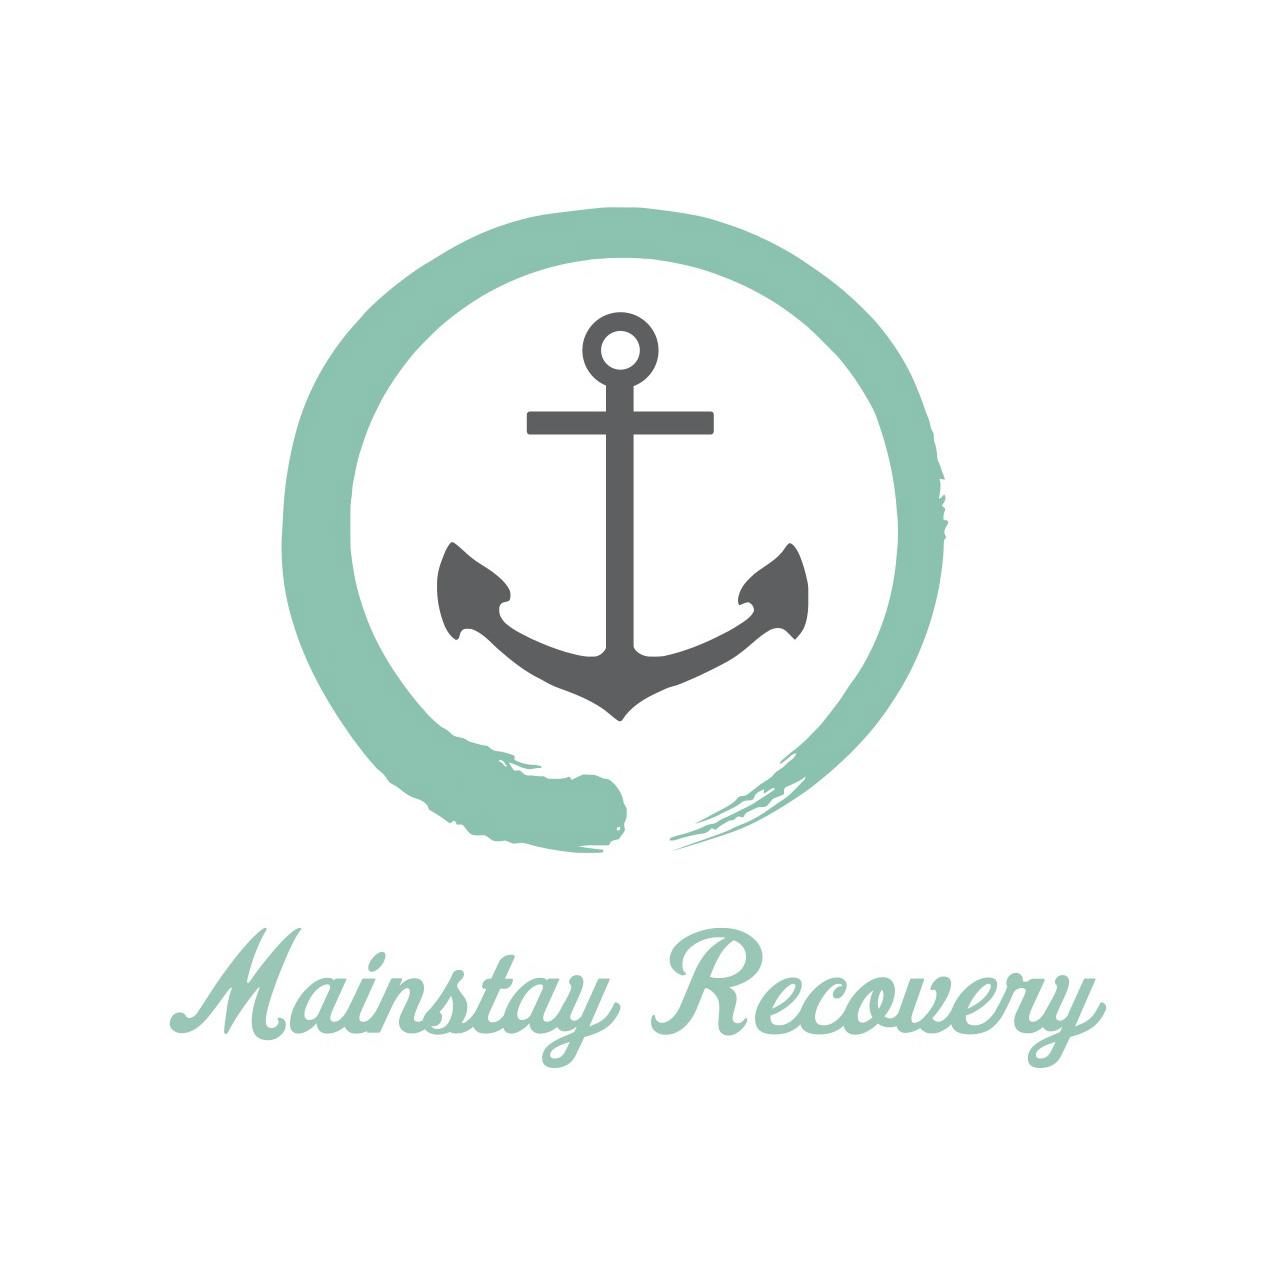 Mainstay Recovery, Mainstay Recovery